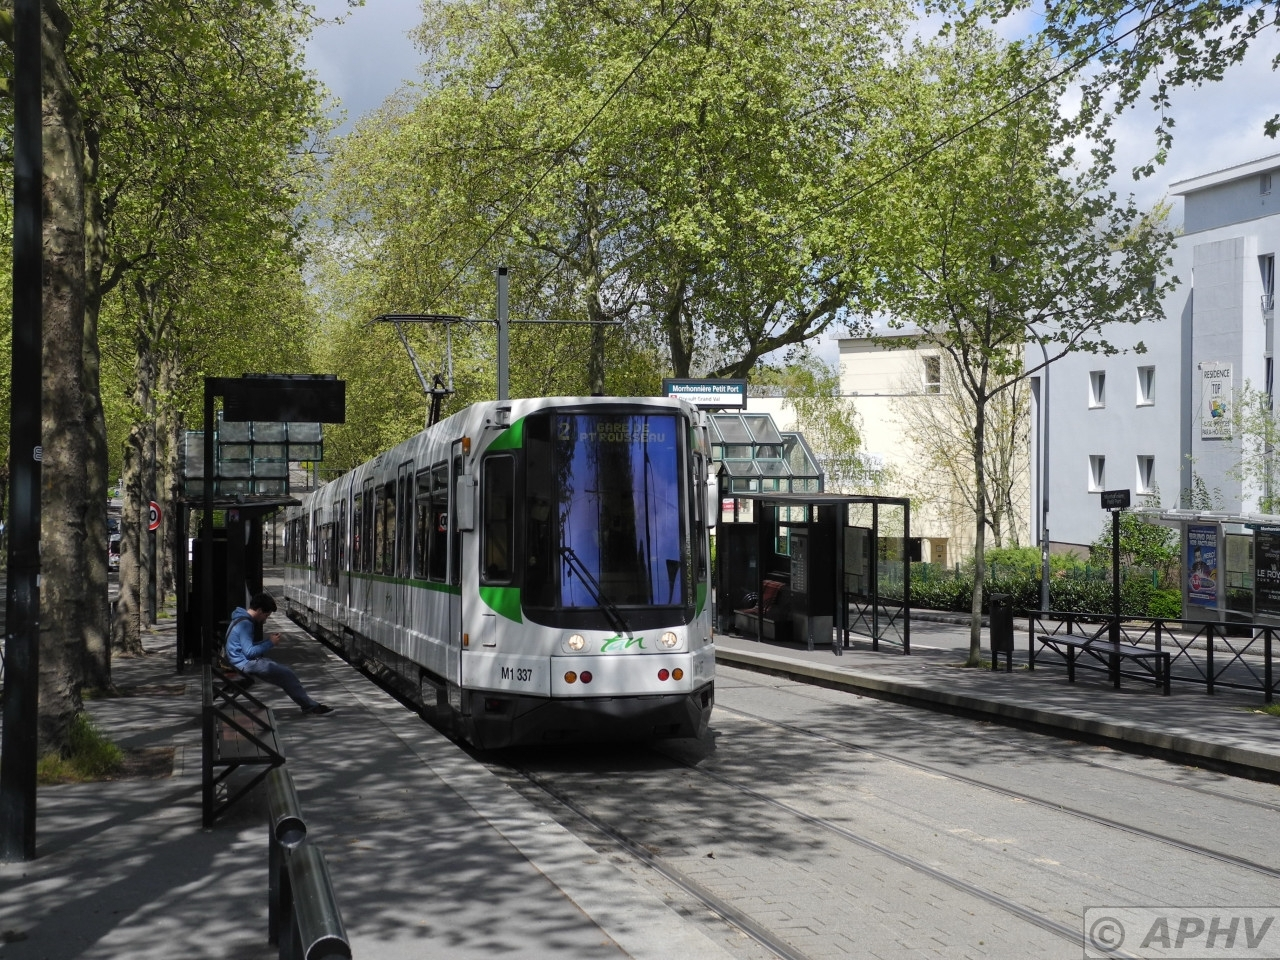 Nantes Peter Velthoen